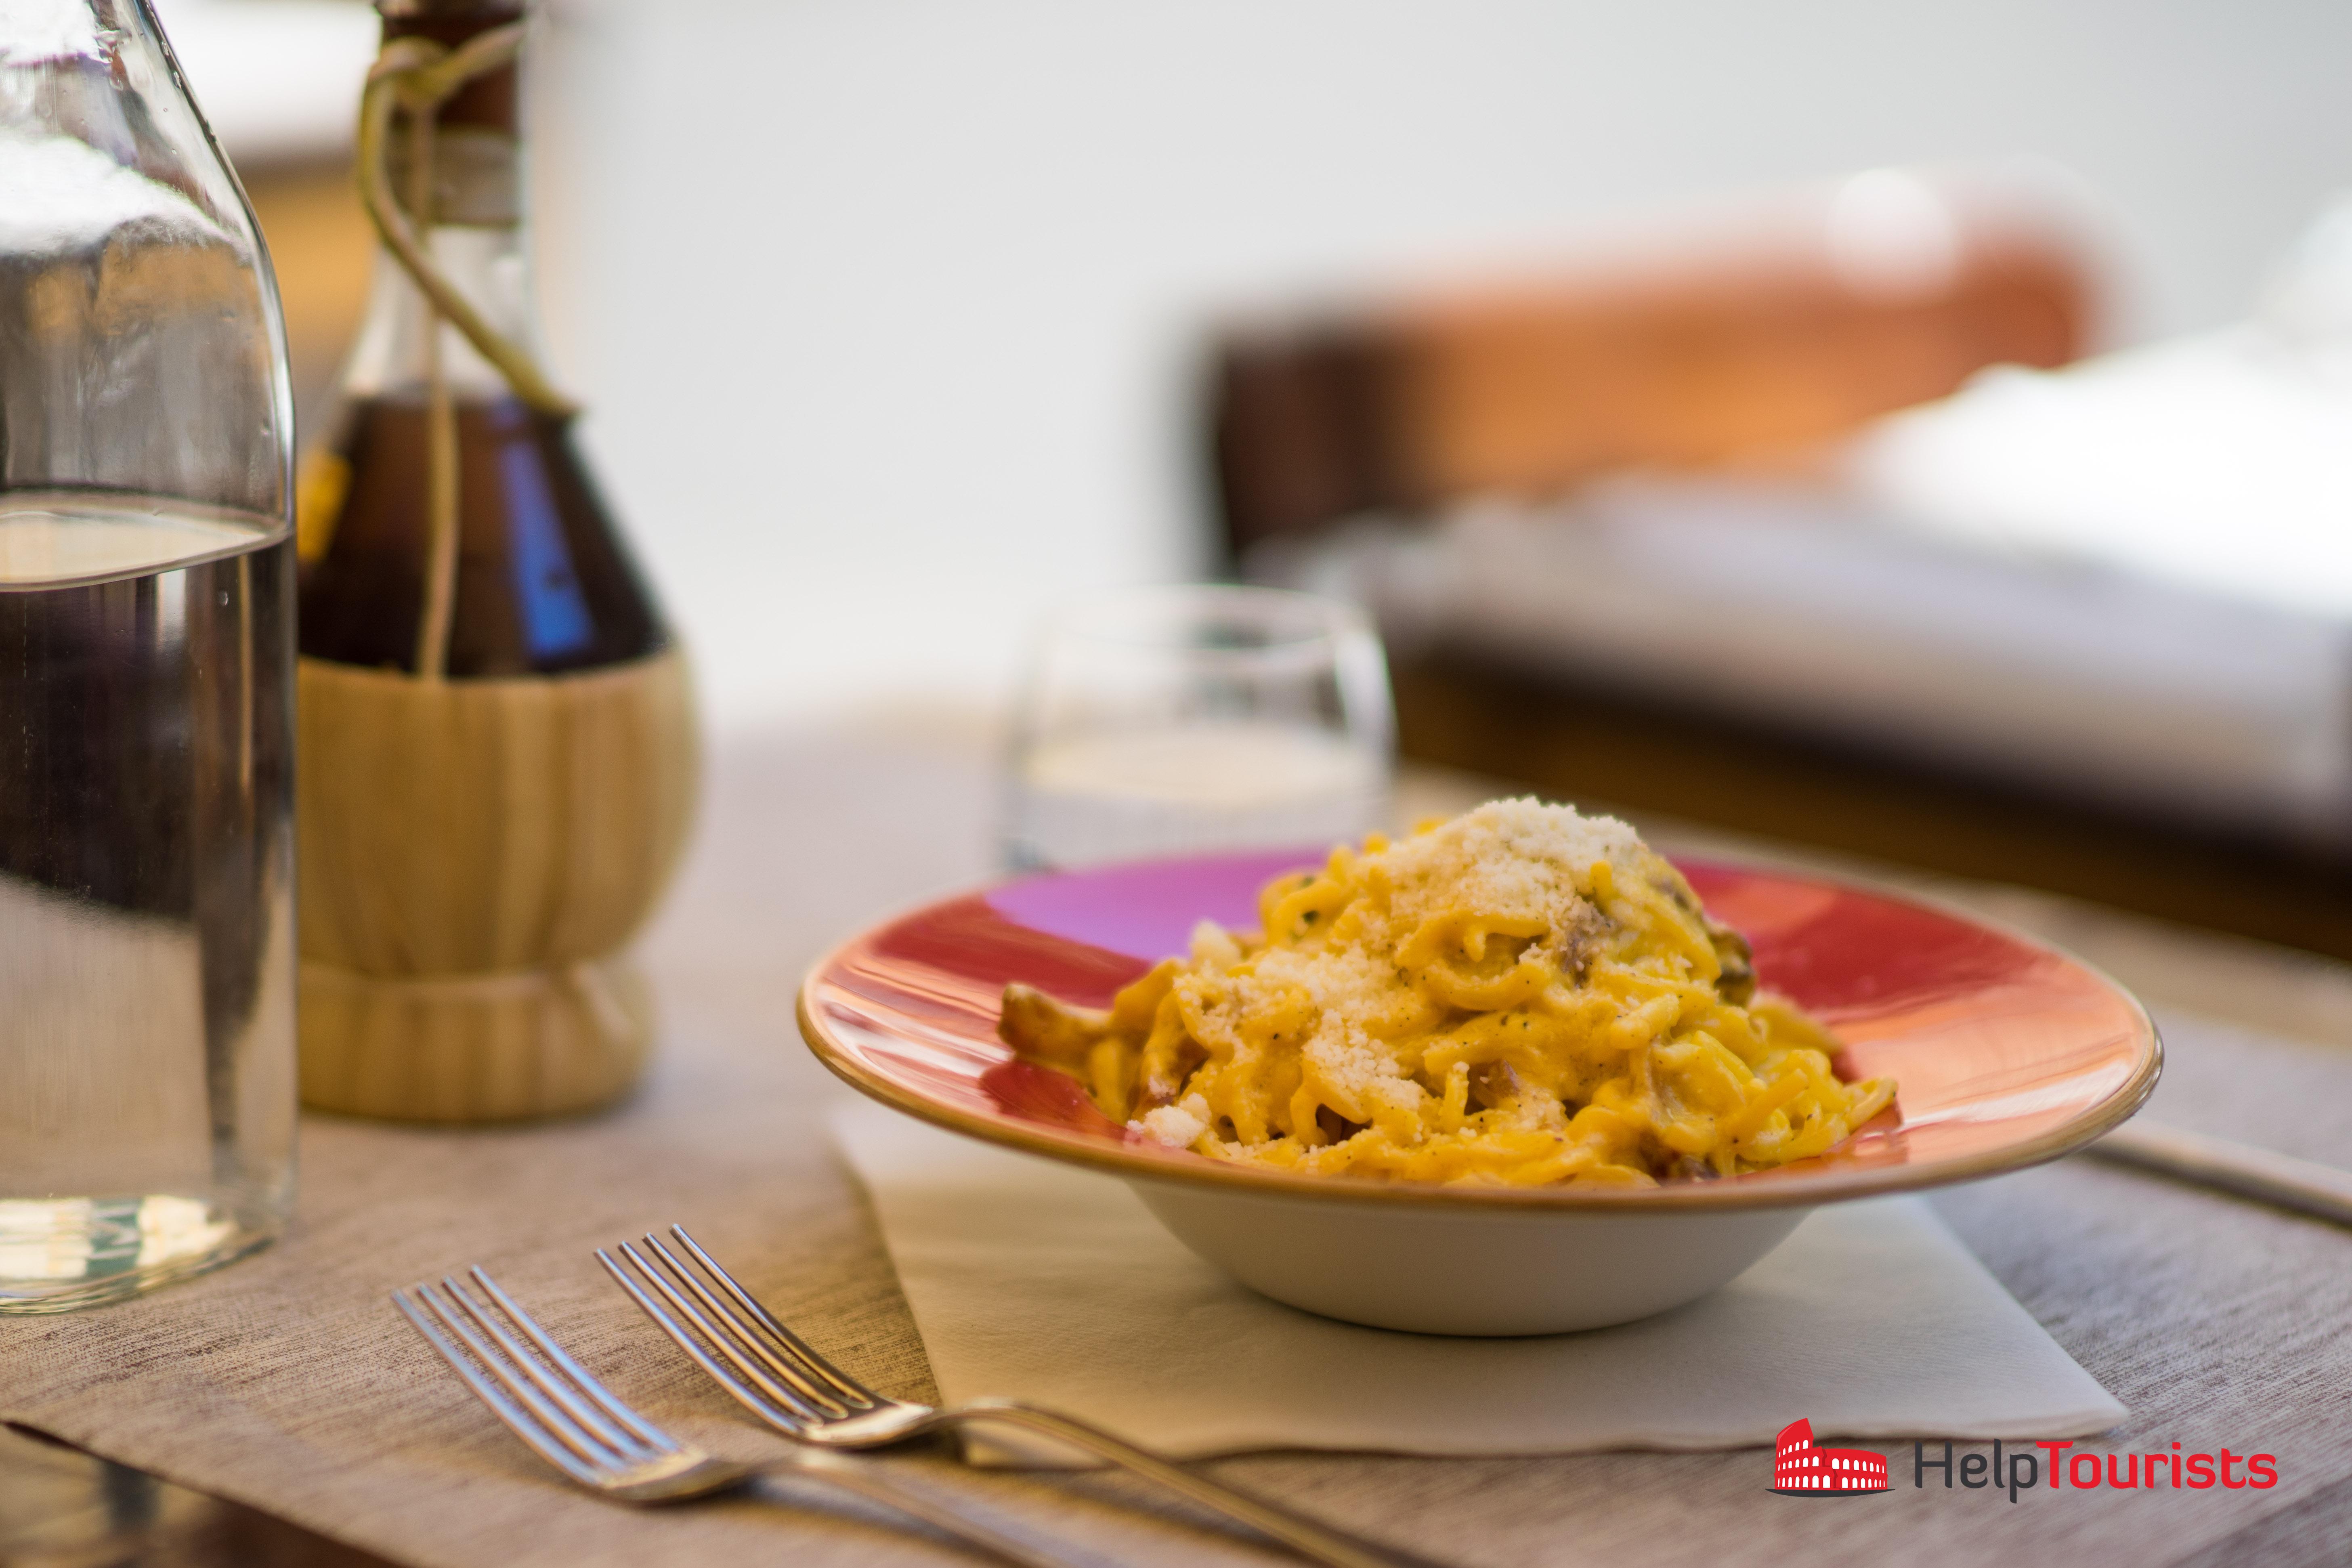 ROM_Antica-Osteria-Rugantino_Pasta_Spaghetti_Carbonara_l